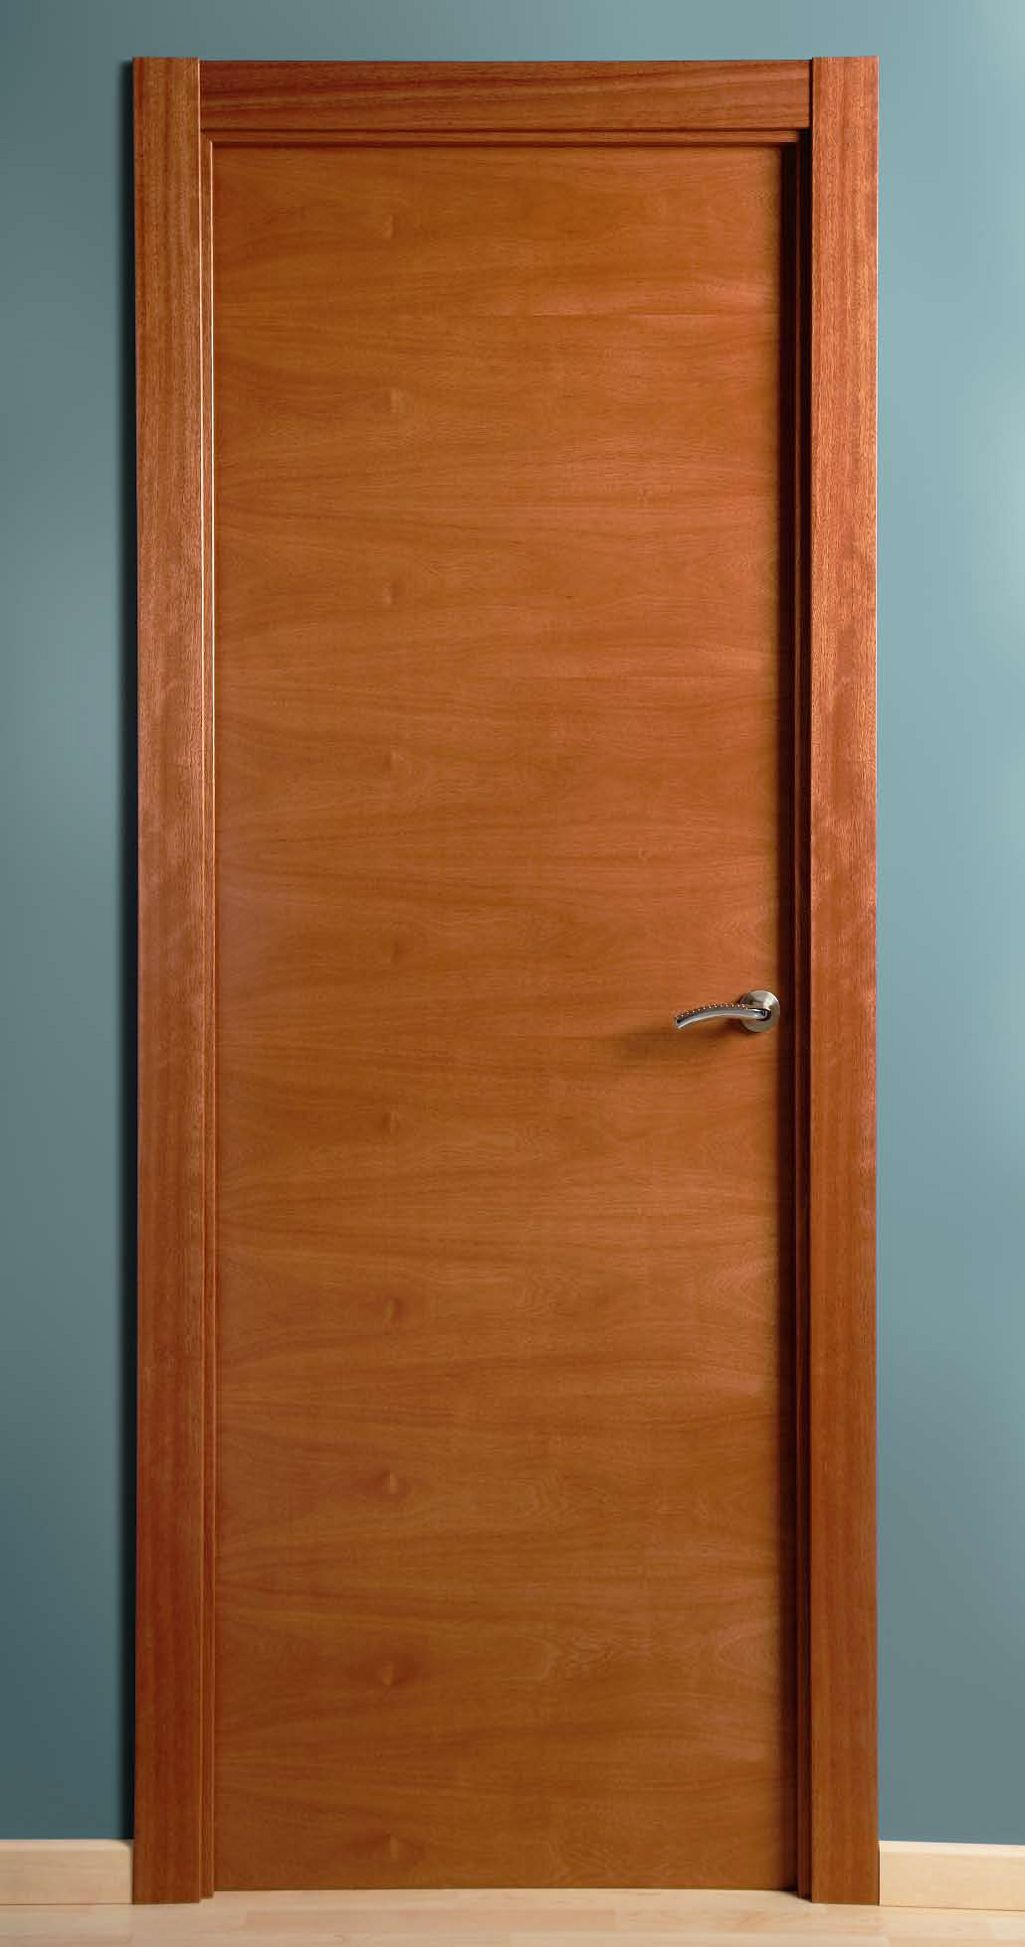 1 2 lisa maciza chapada en horizontal productos de for Precio puerta madera maciza